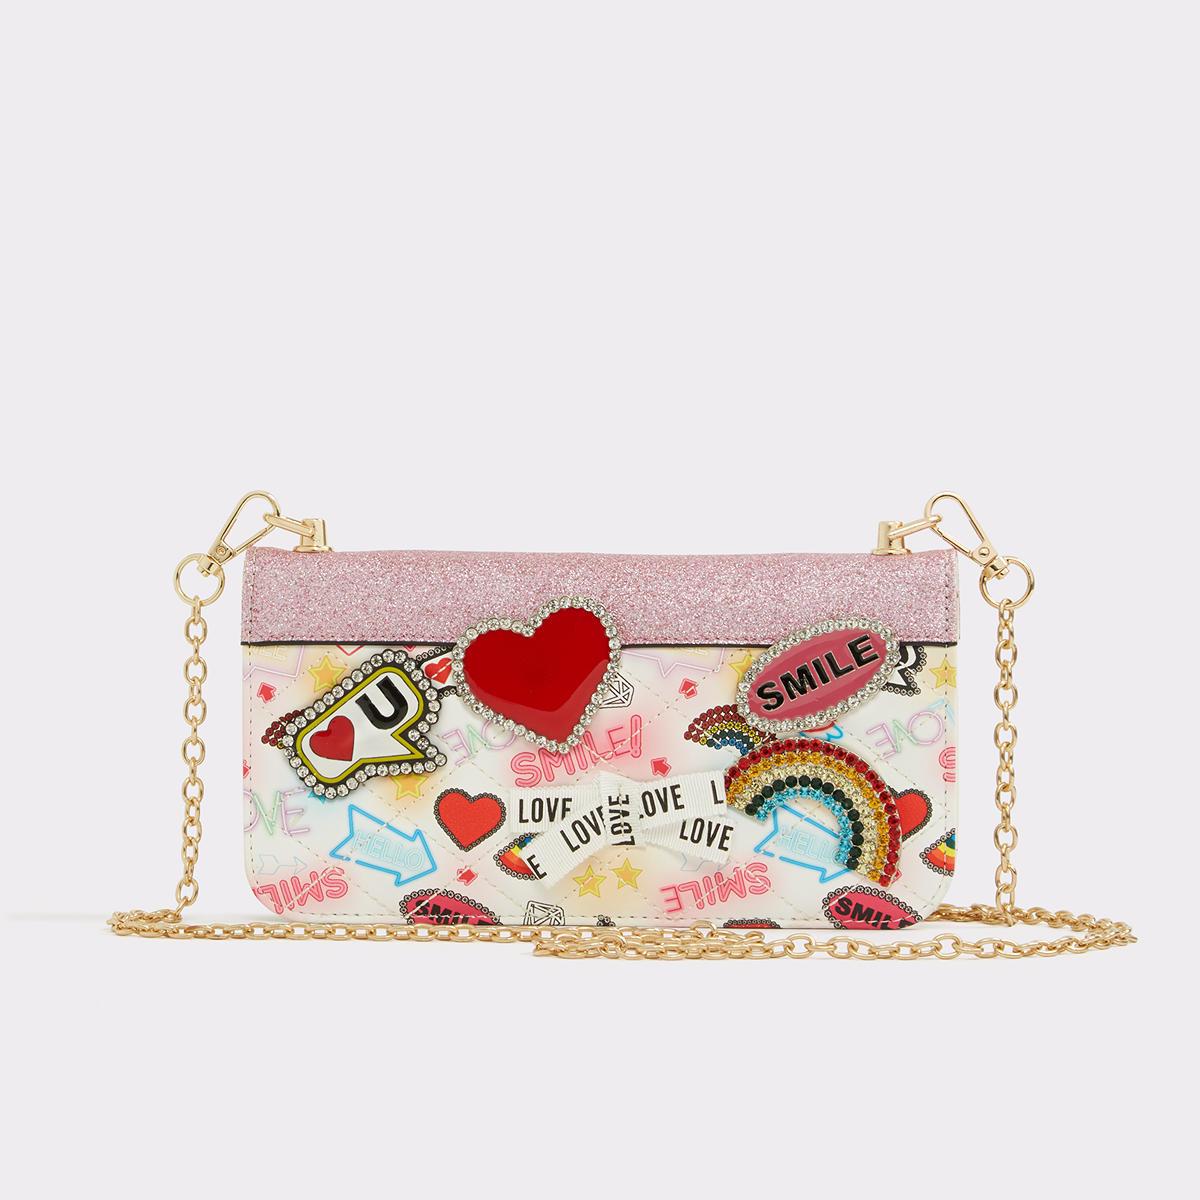 Rattling Pink Misc. Women's Wallets & wristlets | ALDO US at Aldo Shoes in Victor, NY | Tuggl